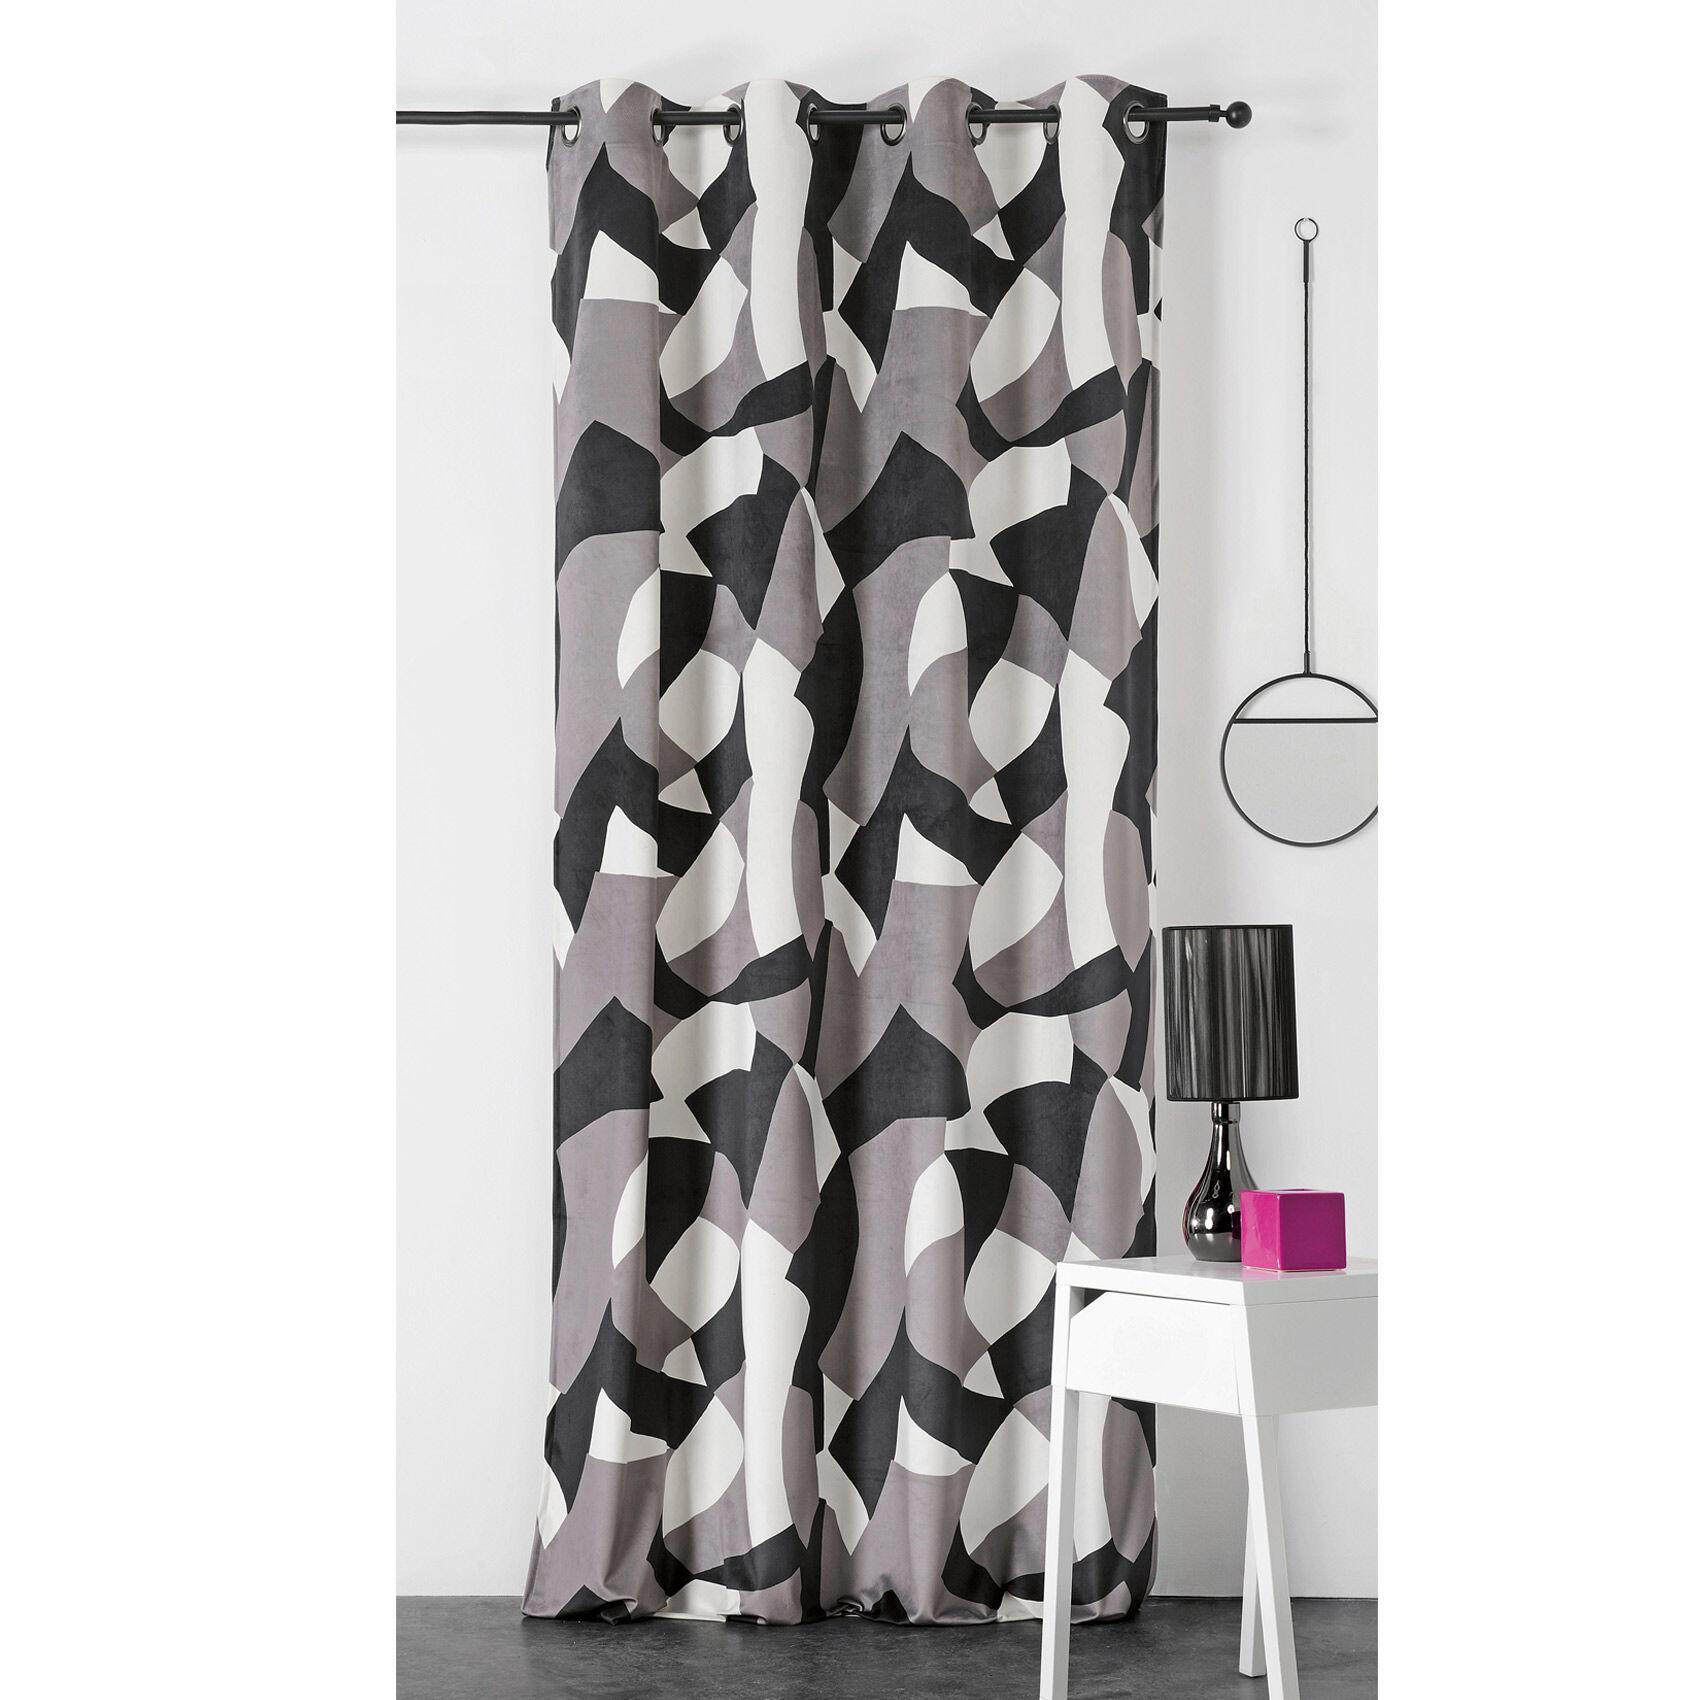 Linder Rideau d'ameublement camo polyester gris 240x145